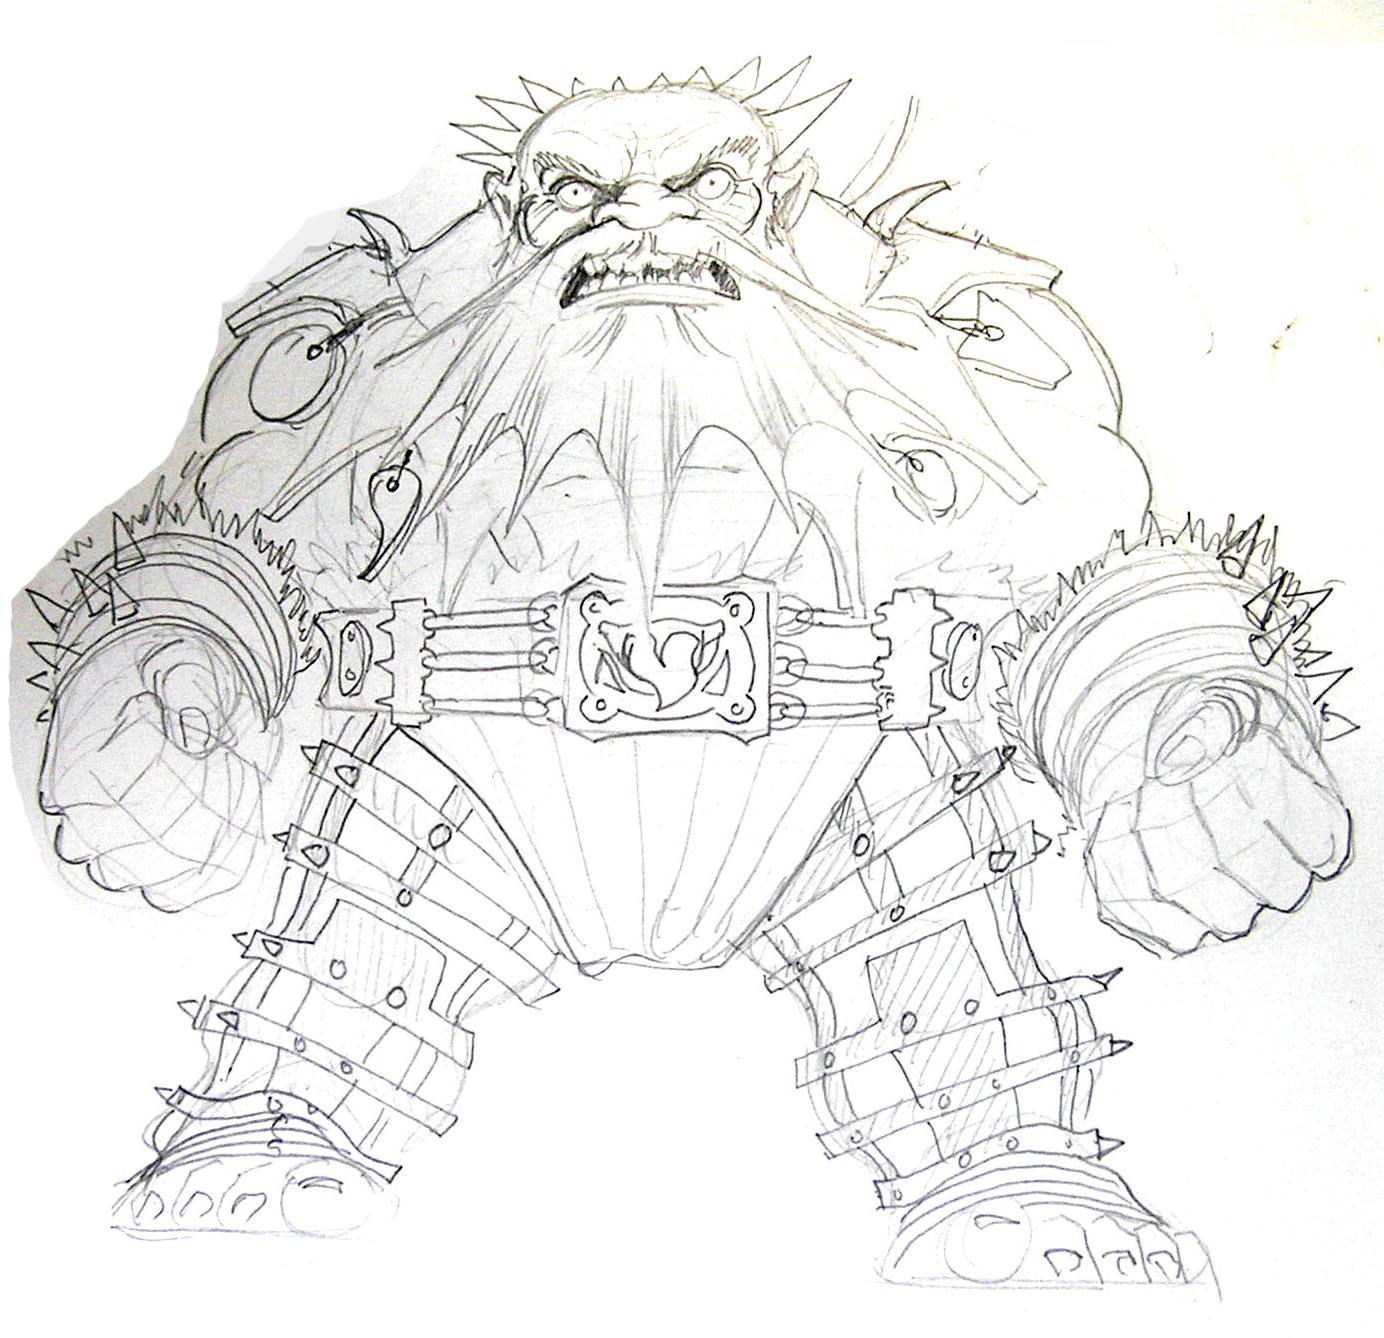 Drawn dwarf berserkers Cavalry for of Berserker Dwarf